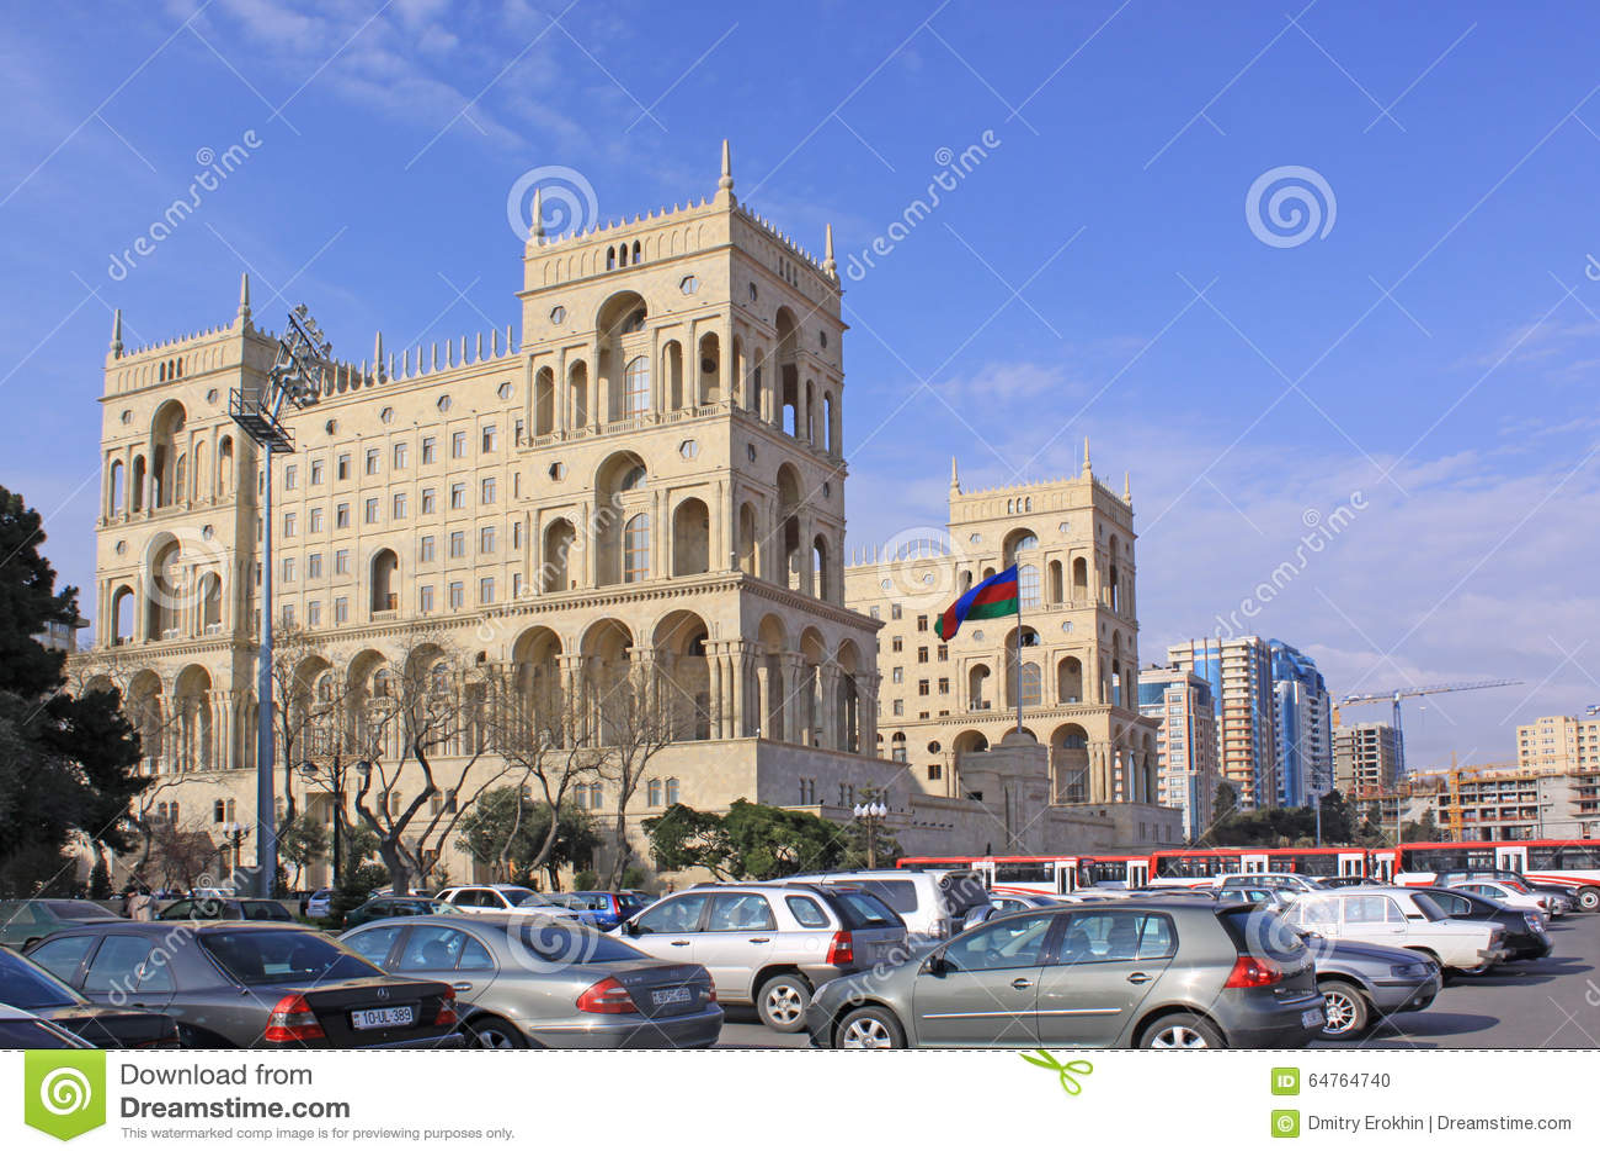 Azerbaijan: cities. Capital and major cities of Azerbaijan 26